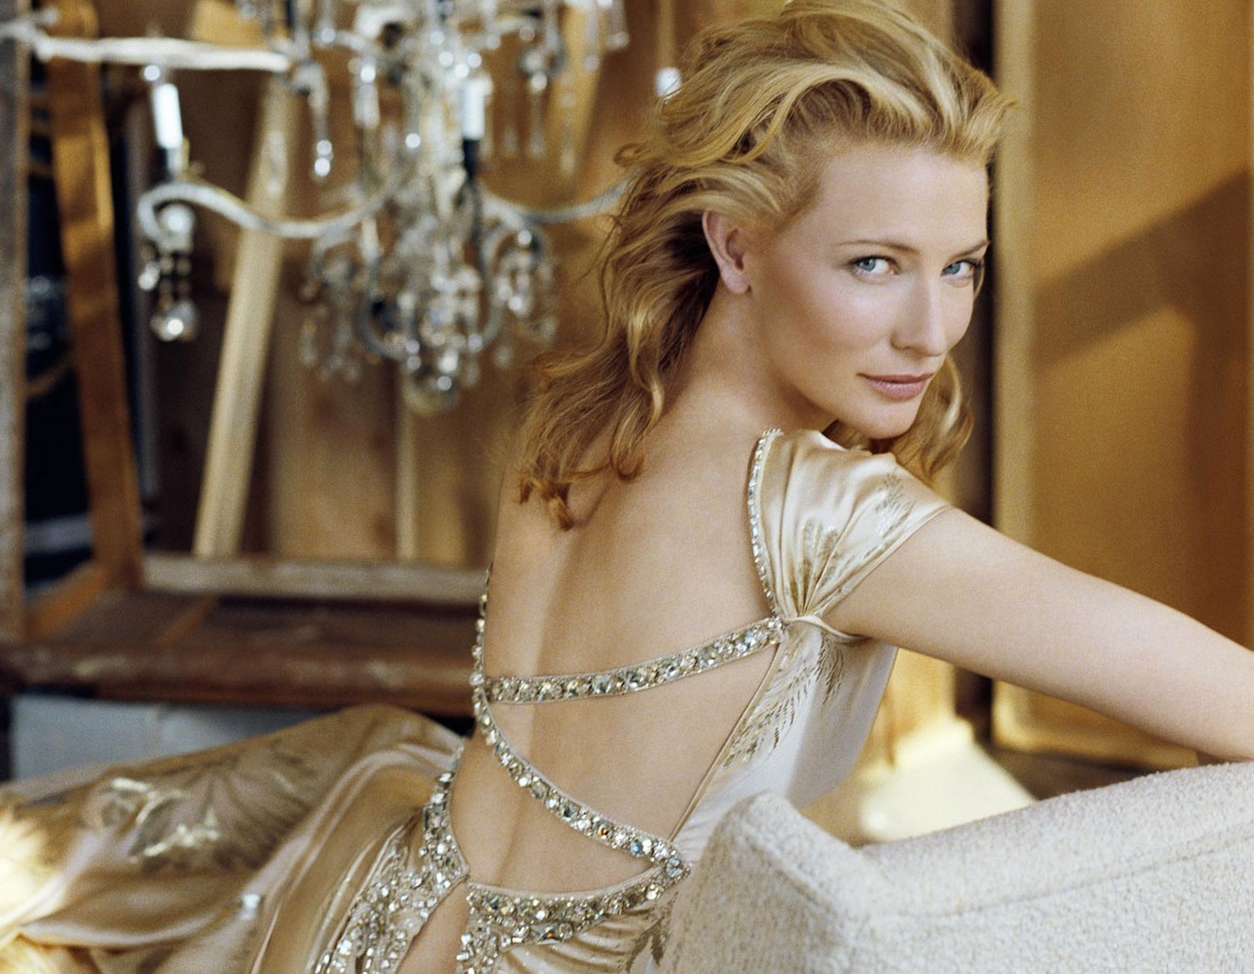 Every oscar winning actress nude scene compilation part 1 7